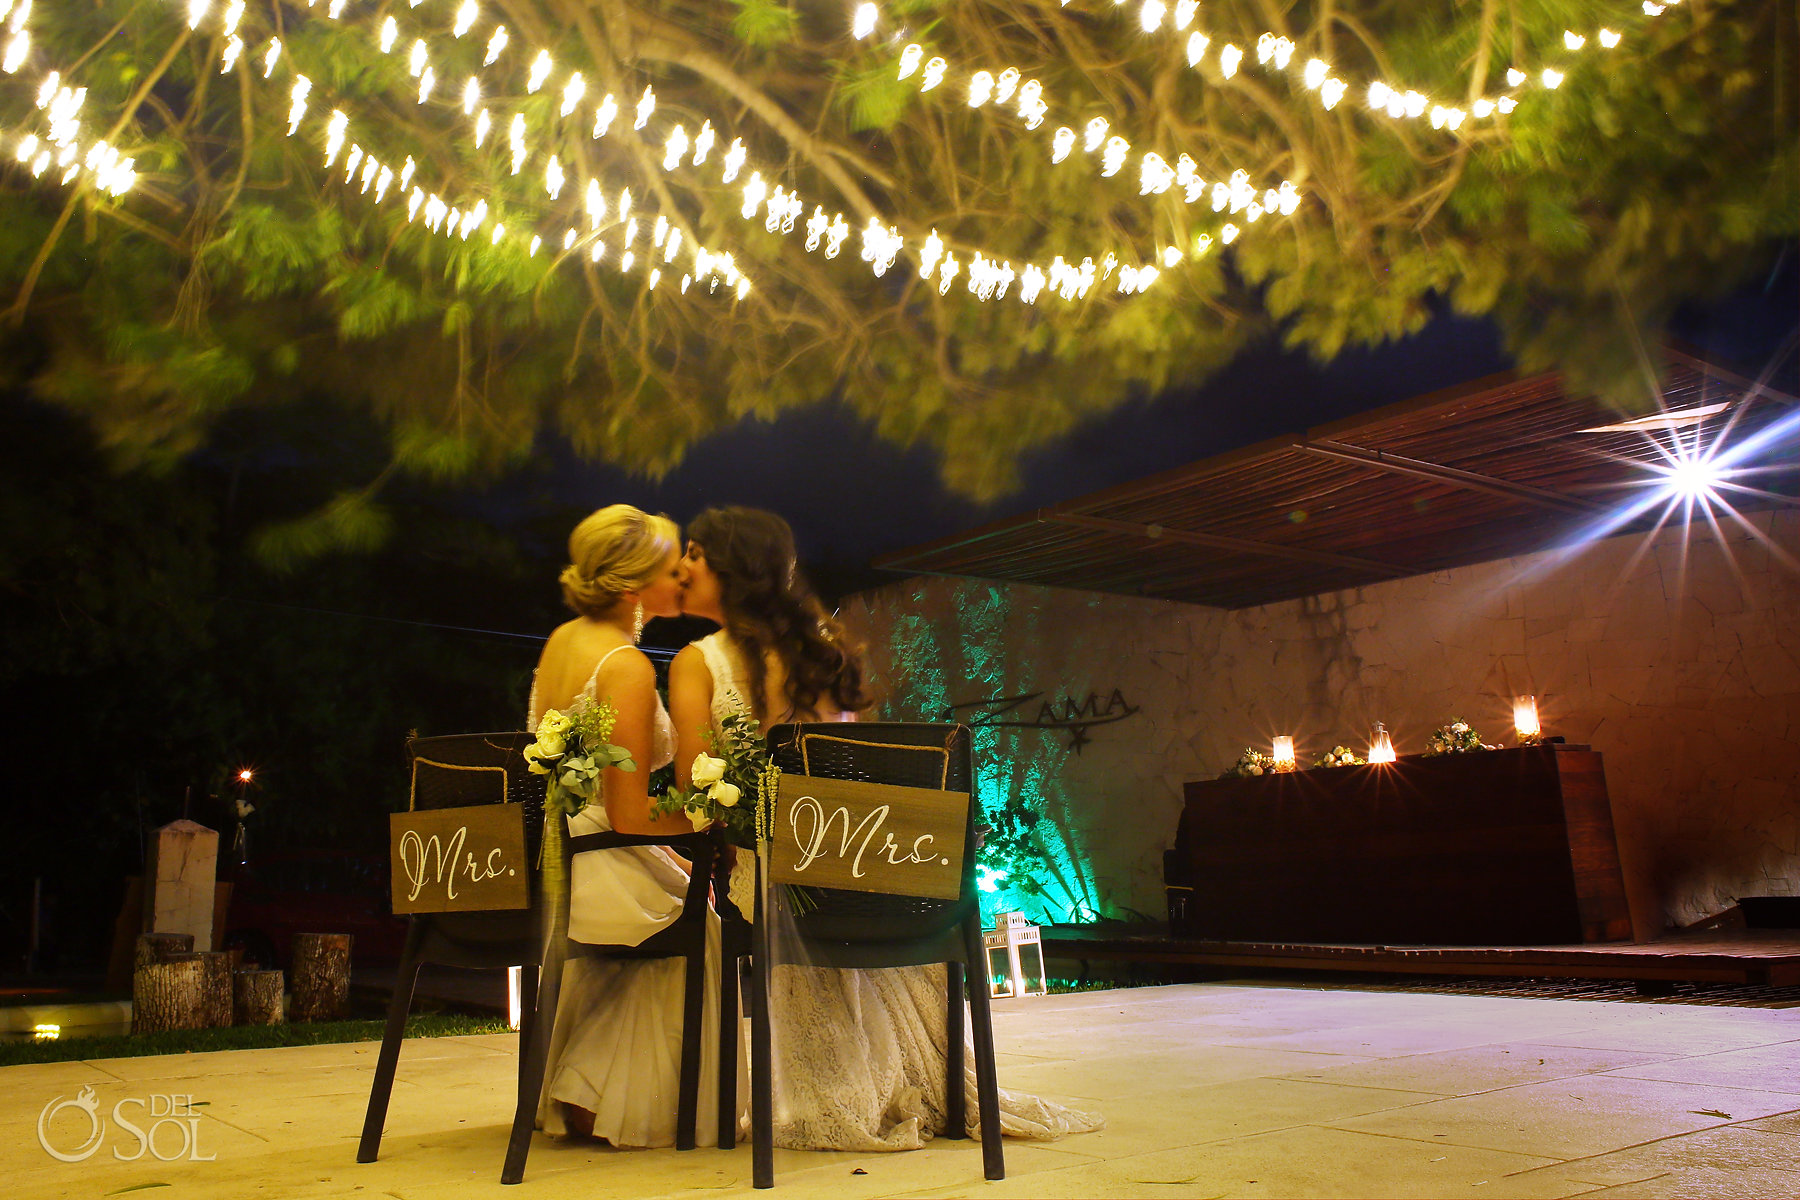 Mrs. and Mrs. Lesbian wedding boards kiss